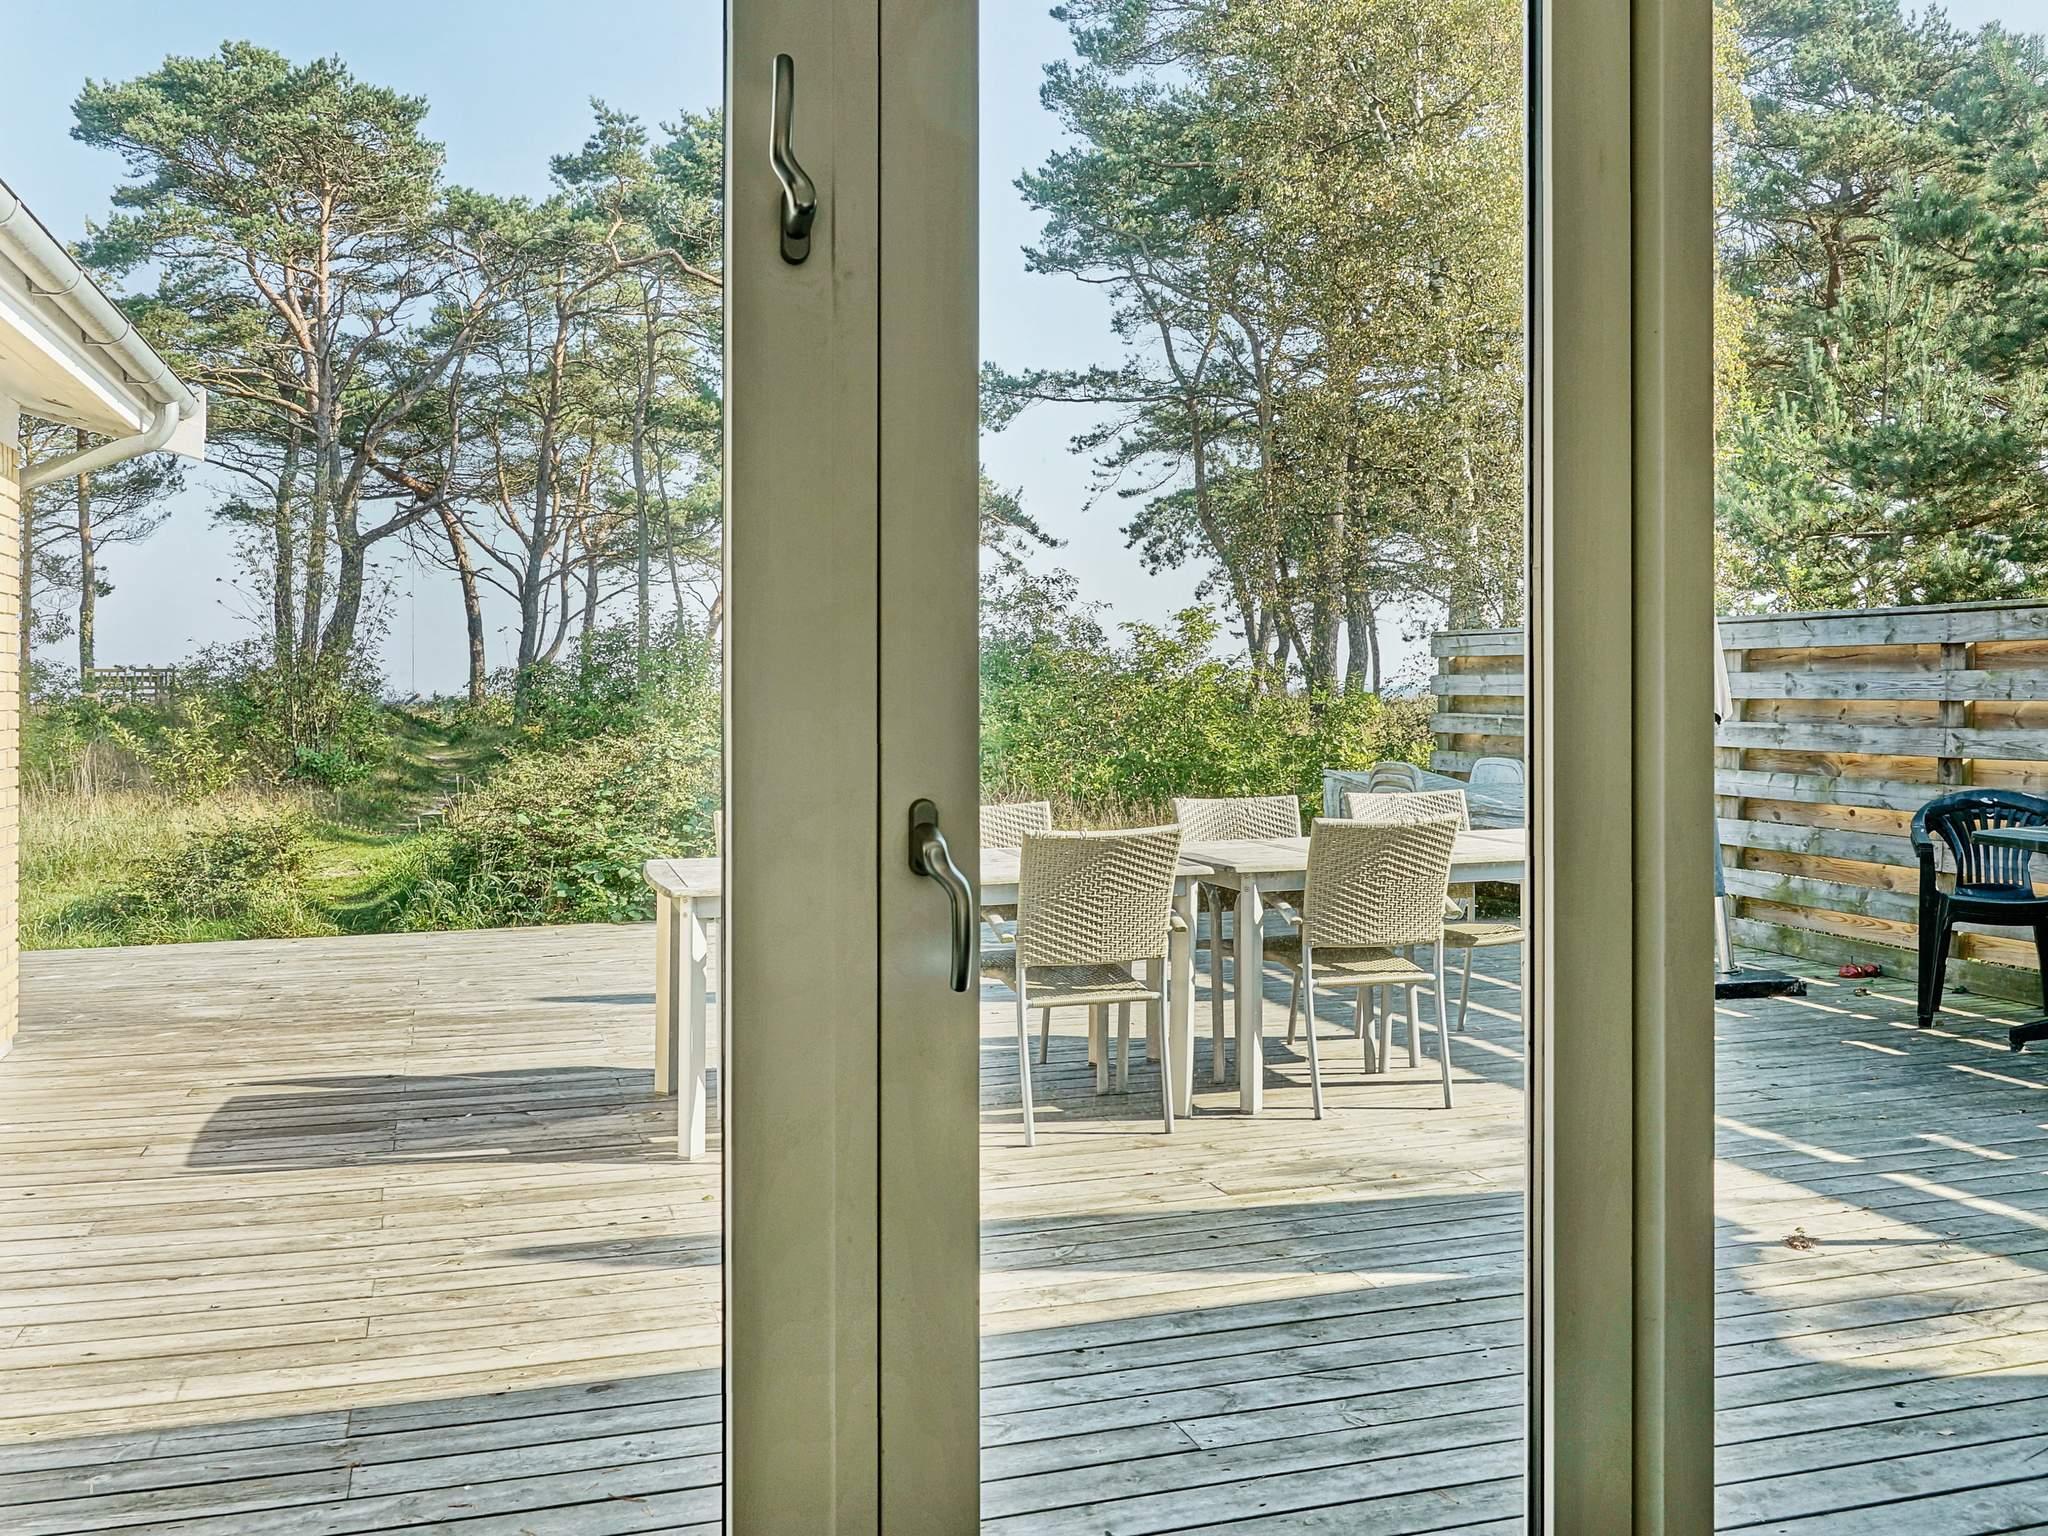 Ferienhaus Balka Strand (586595), Balke, , Bornholm, Dänemark, Bild 24